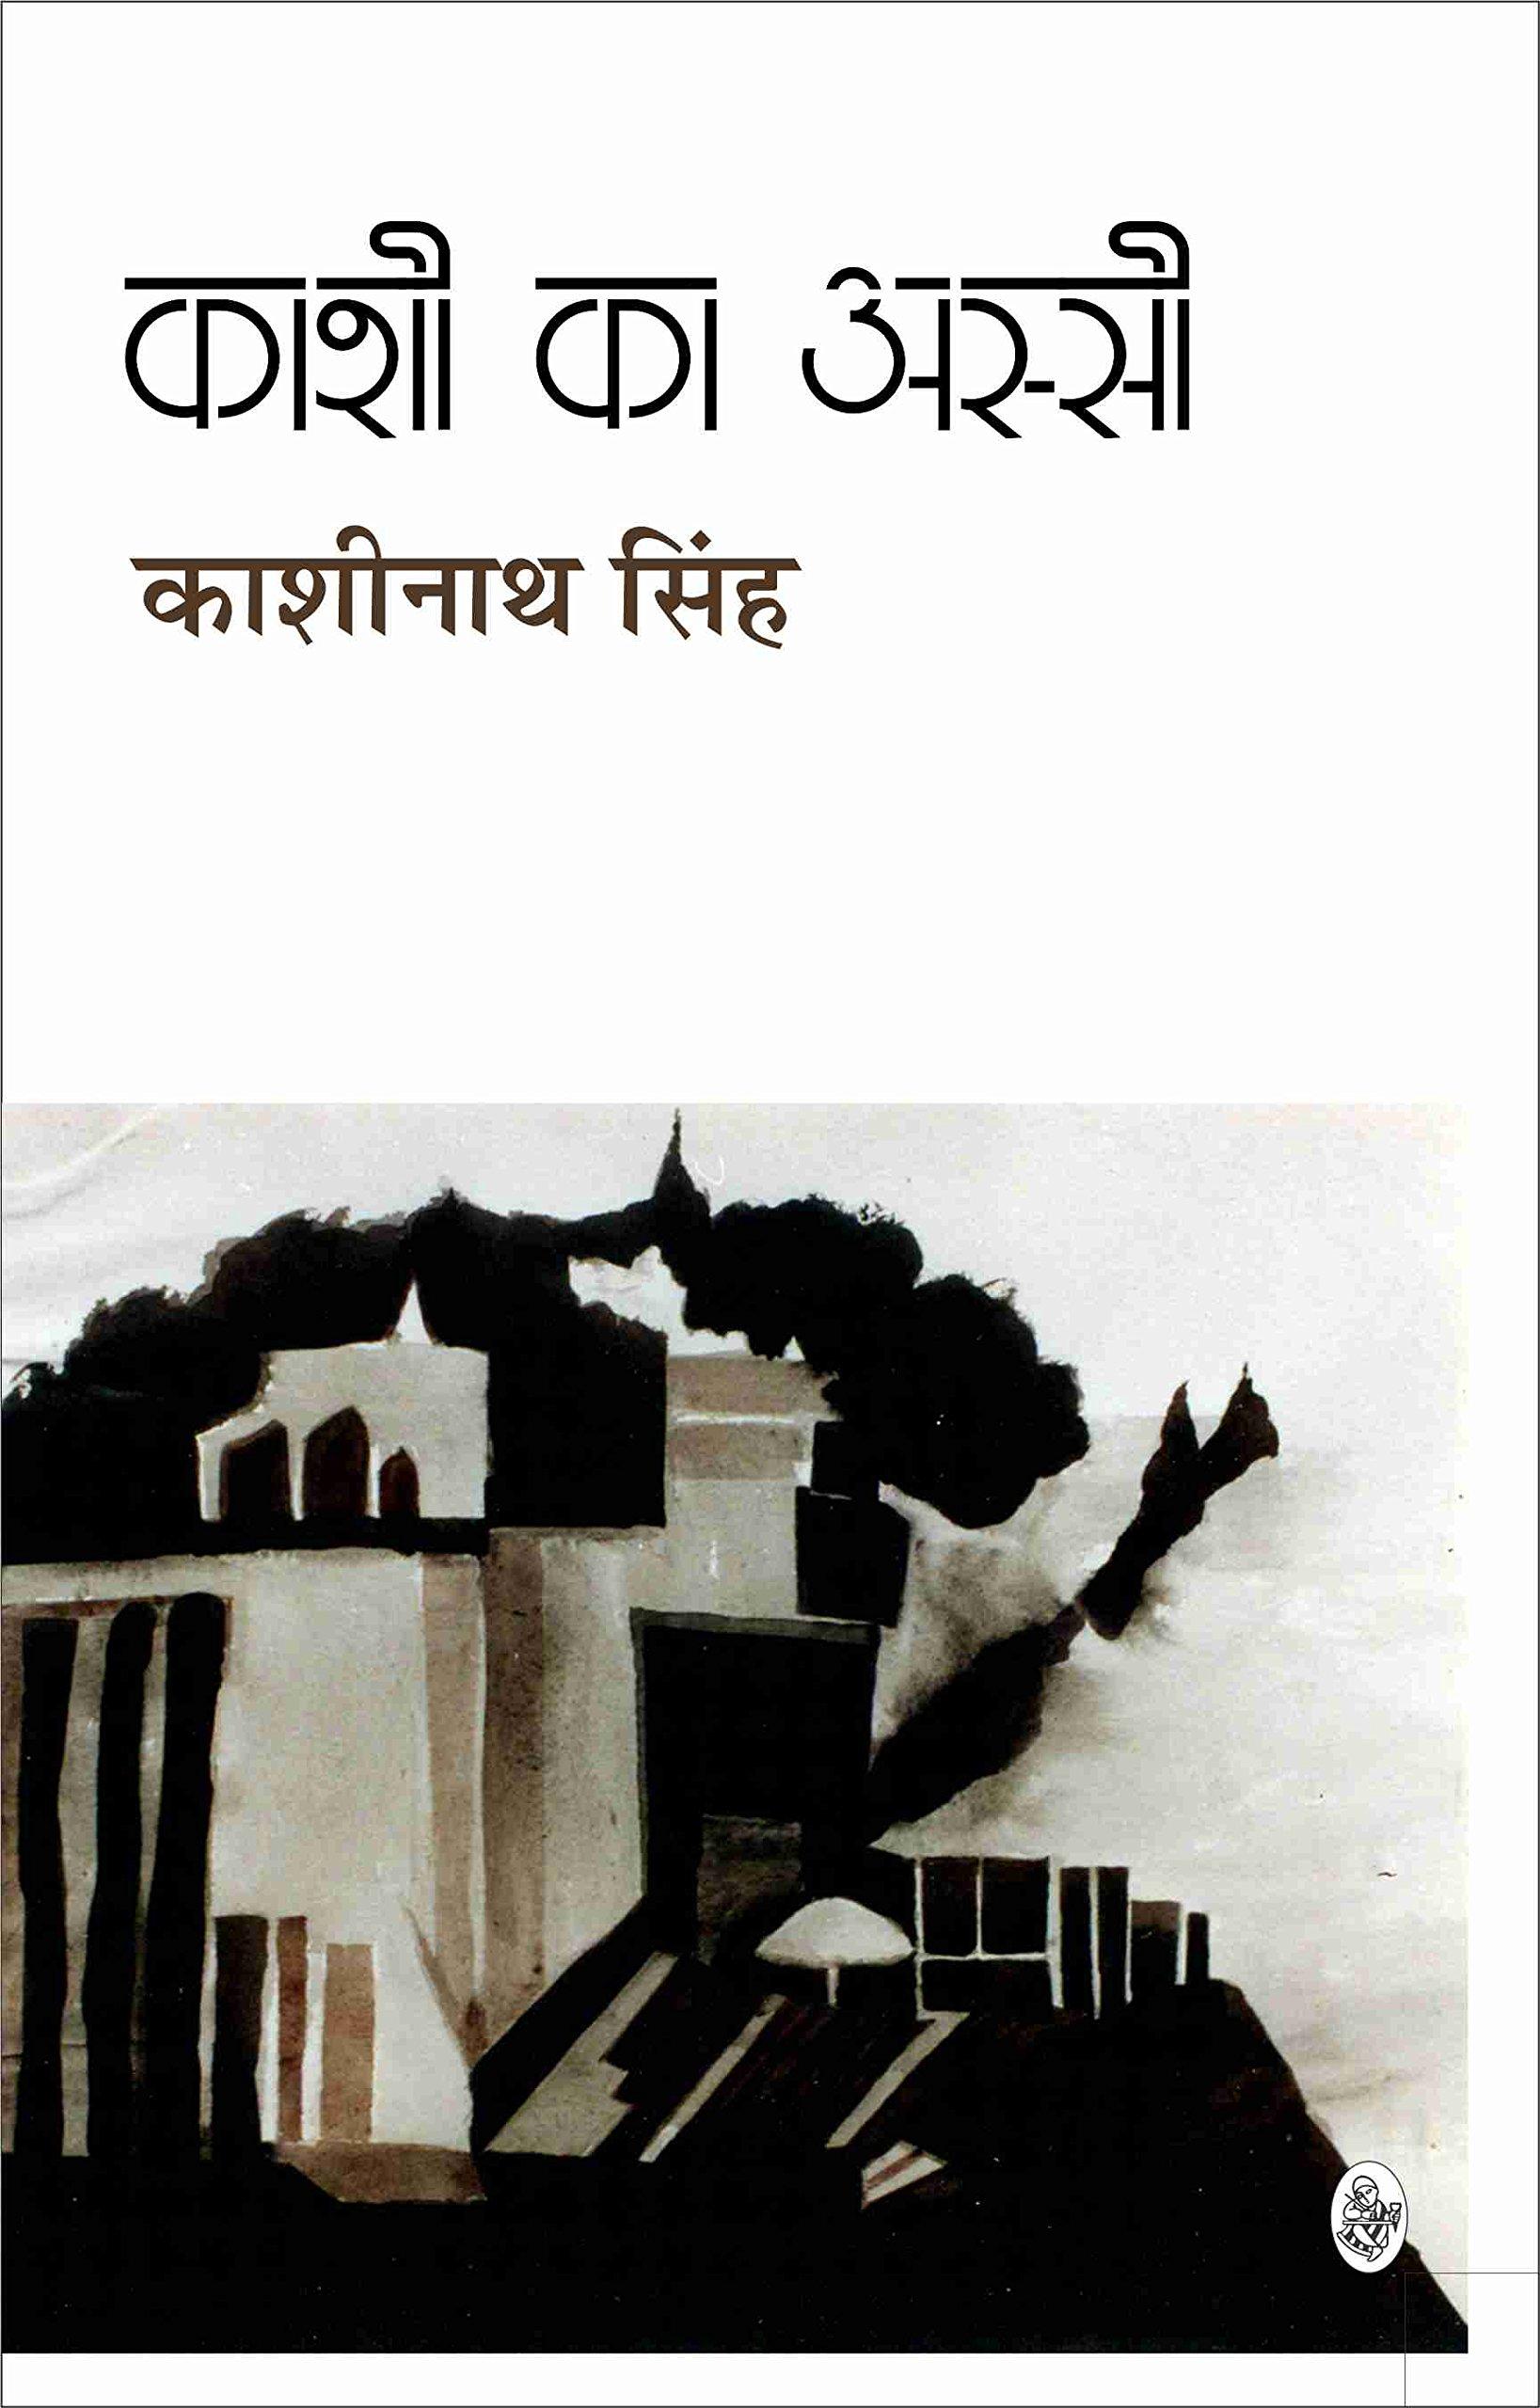 Kashi Ka Assi Kashinath Singh Book Cover